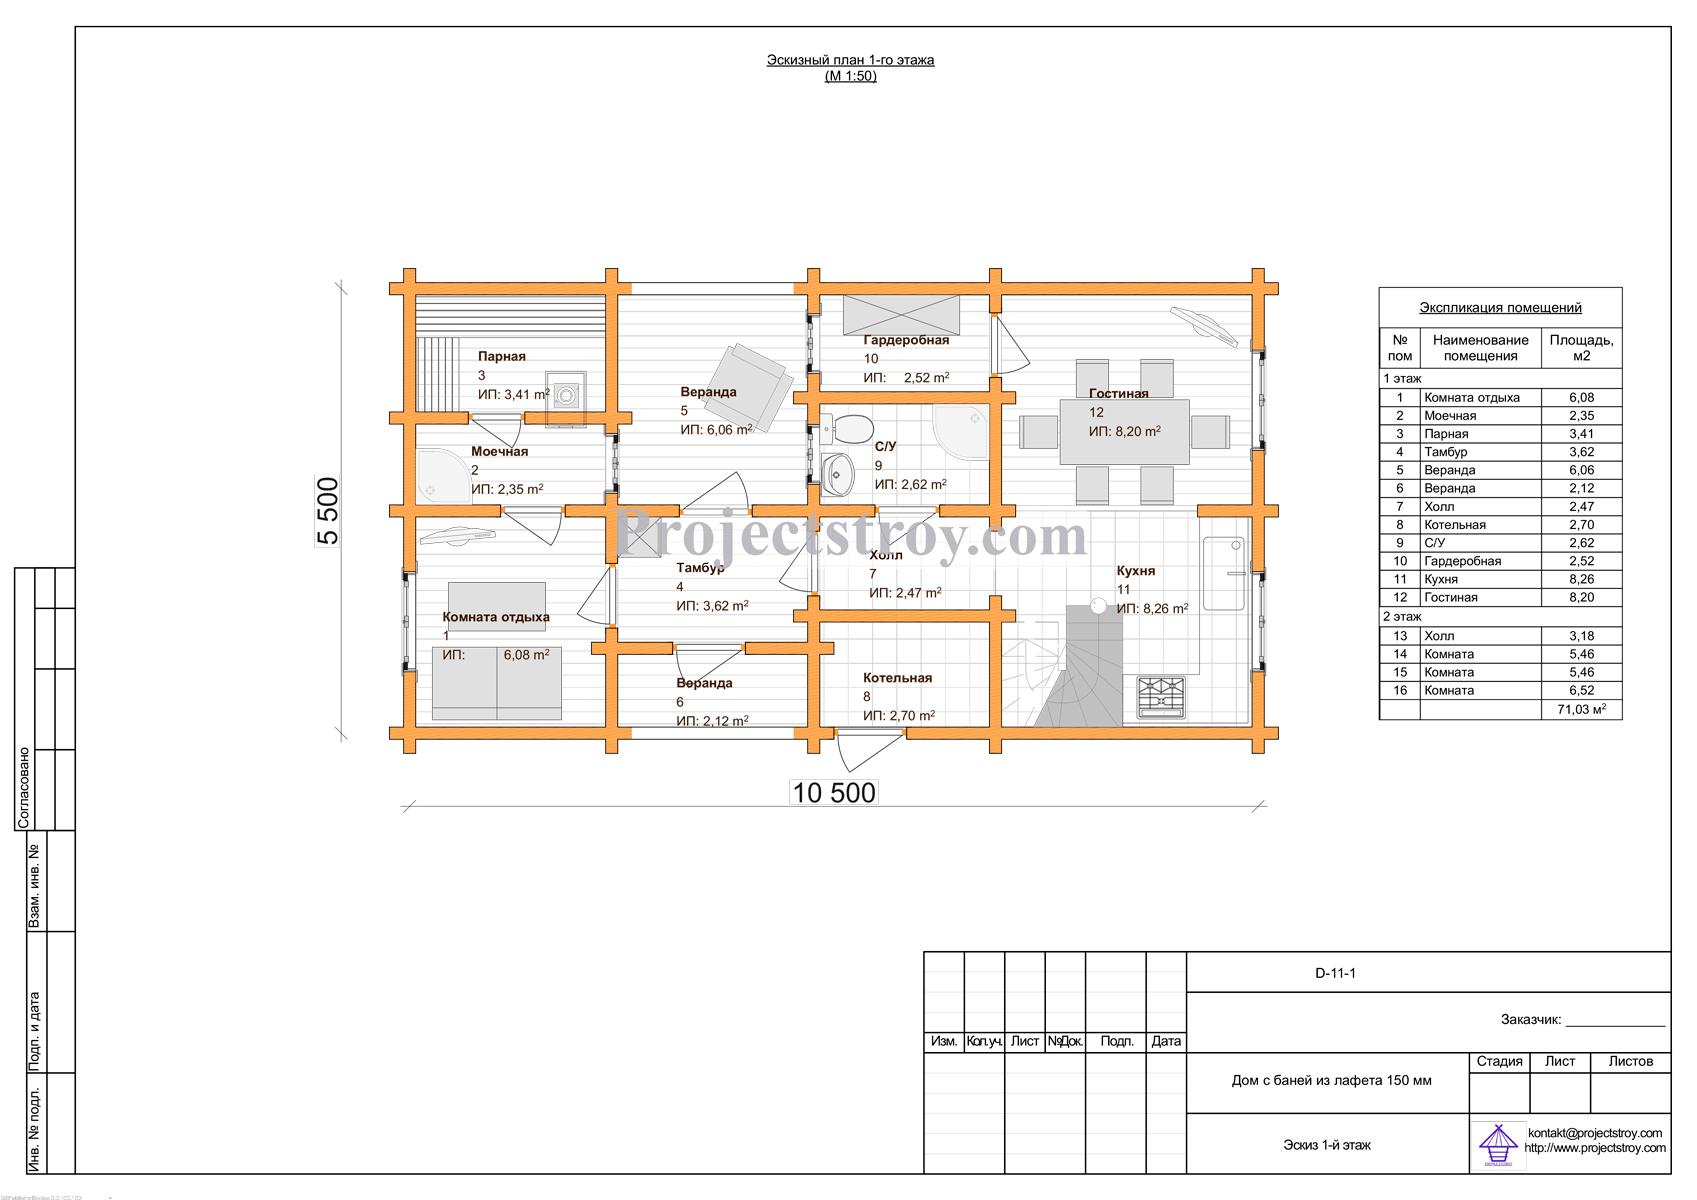 Дом-баня из лафета - проект + разбрусовка план